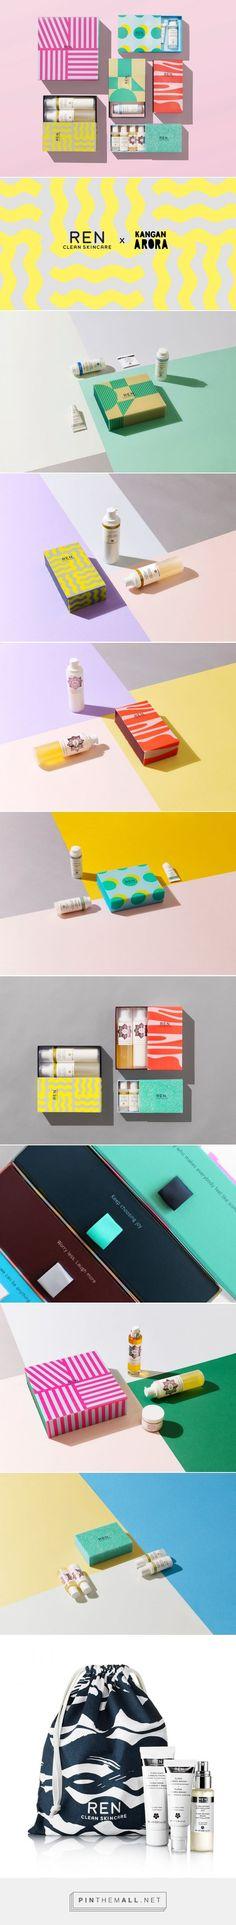 Kangan Agora for REN Skincare Christmas Package / Designed by Kangan Arora in Collaboration with REN Skincare